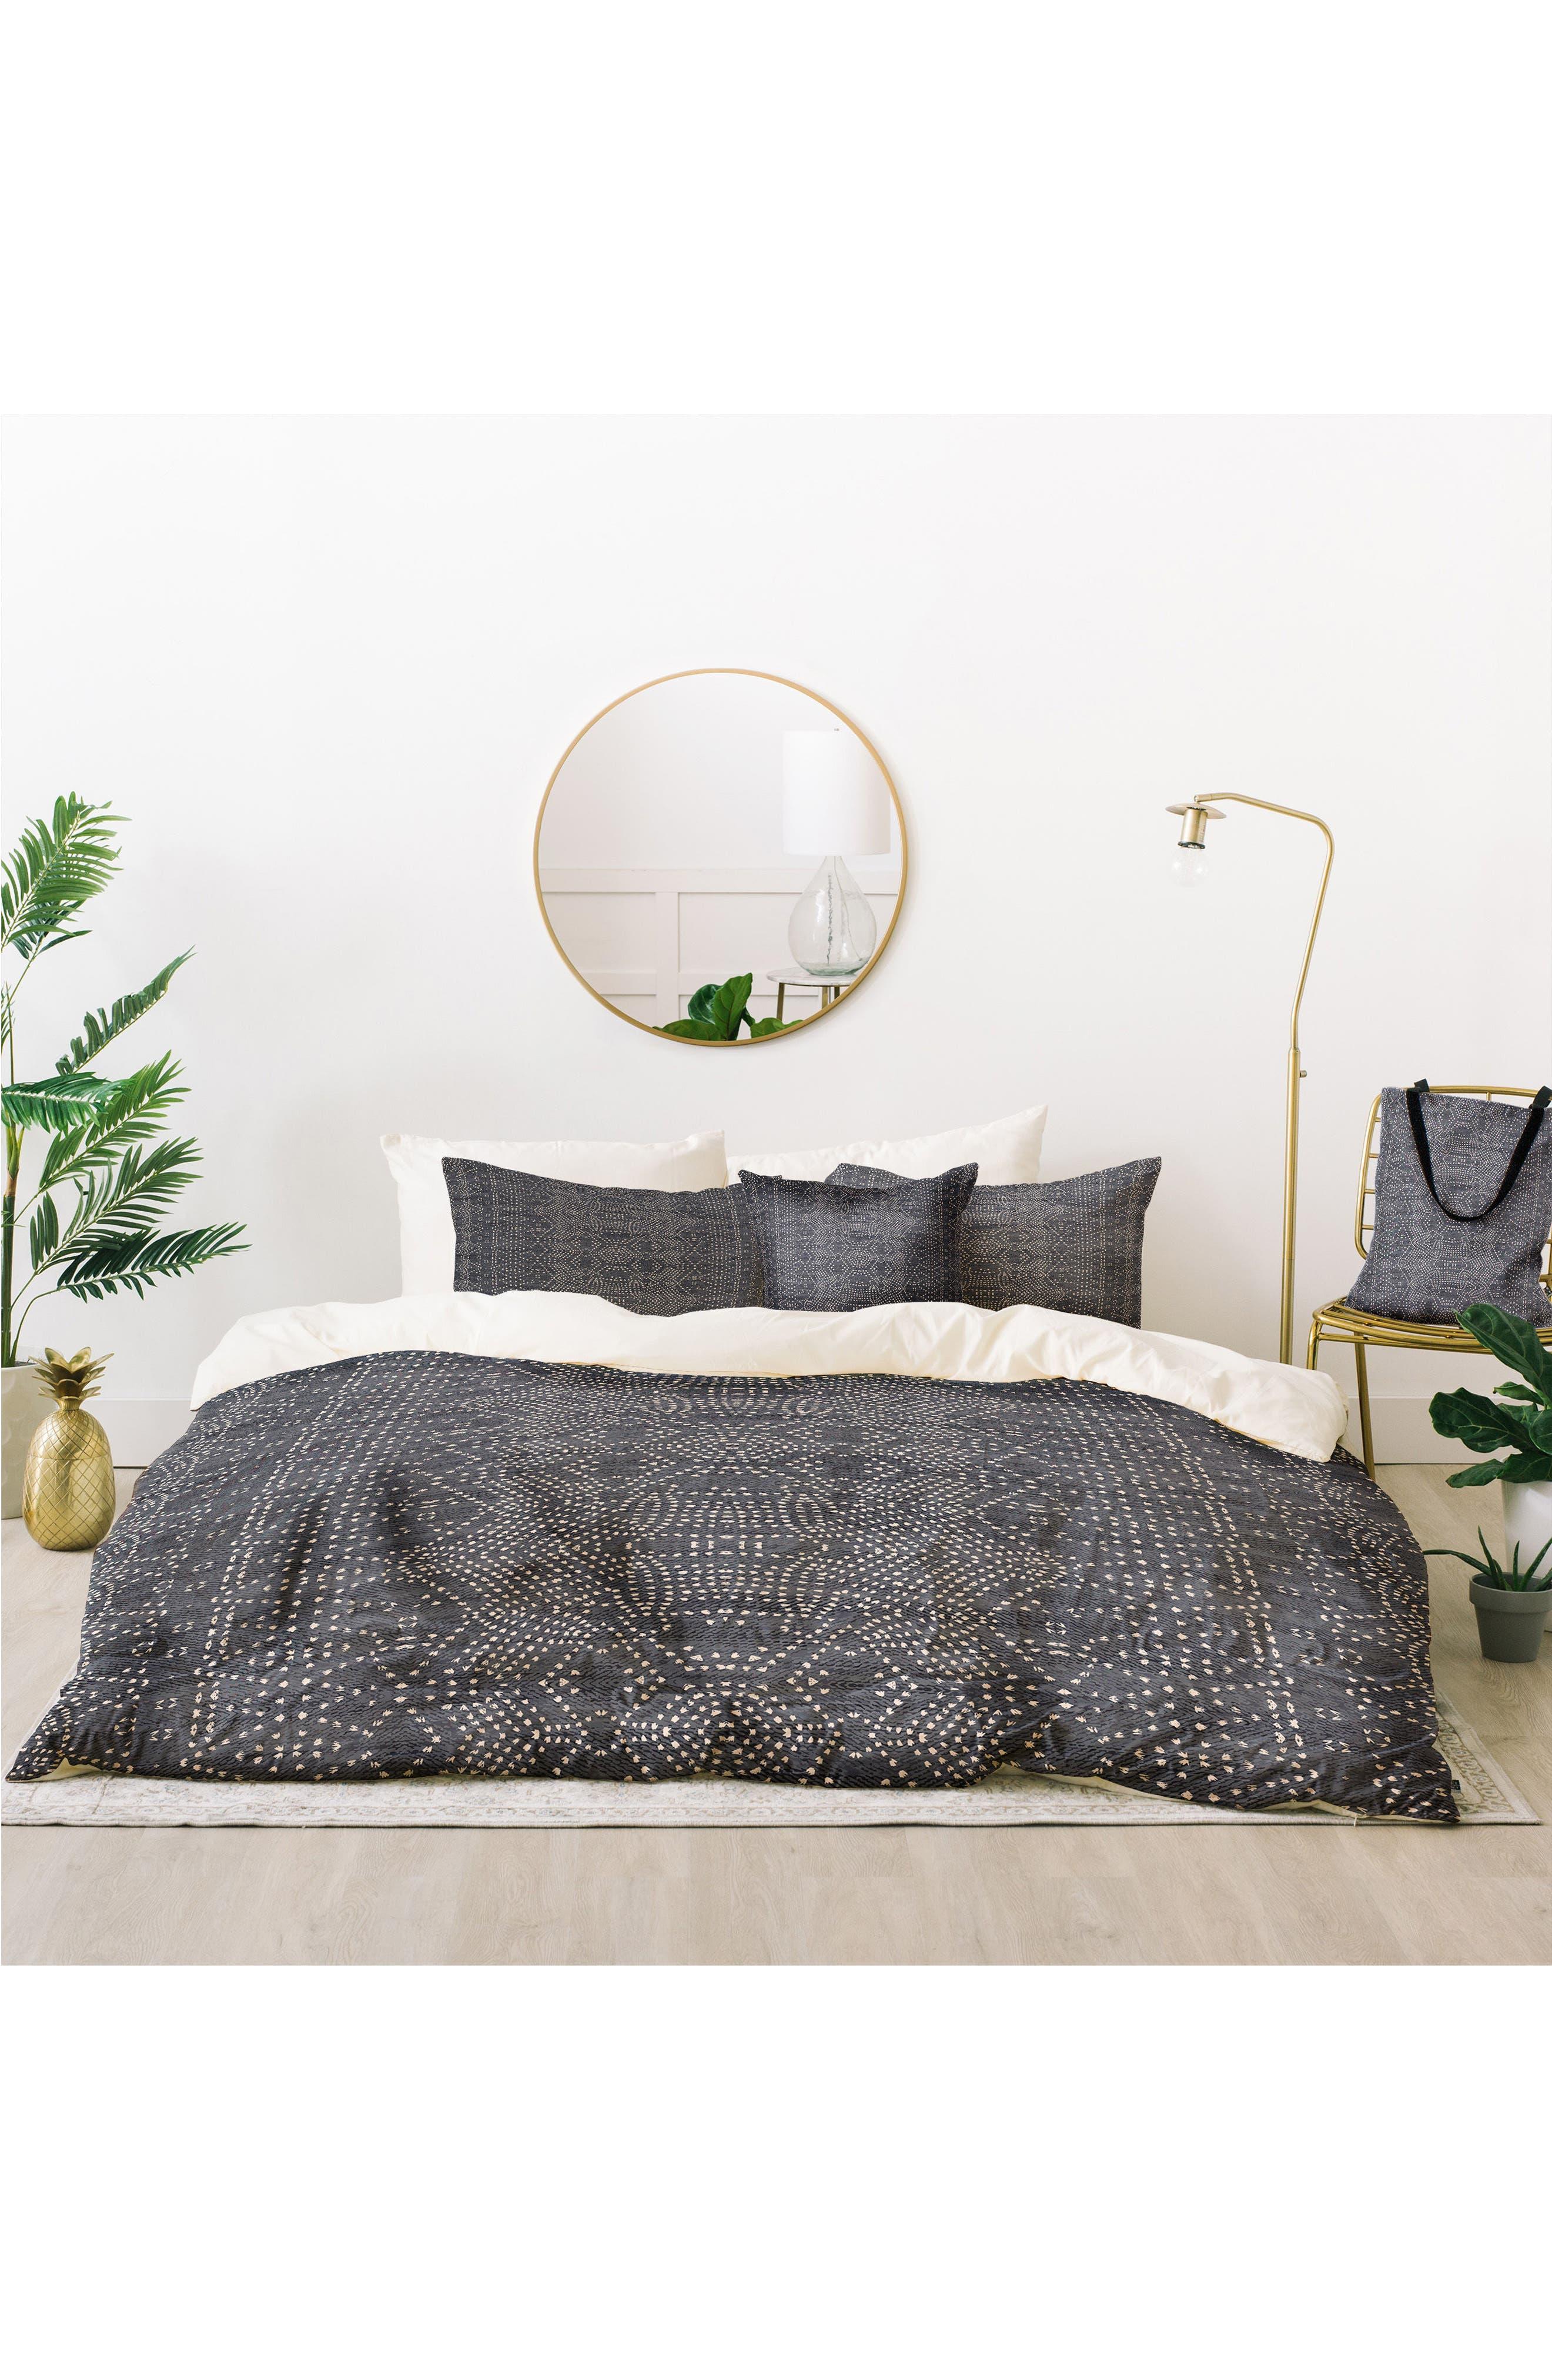 Holli Zollinger Marrakeshi Denim Bed in a Bag Duvet Cover, Sham & Accent Pillow Set,                         Main,                         color, 020